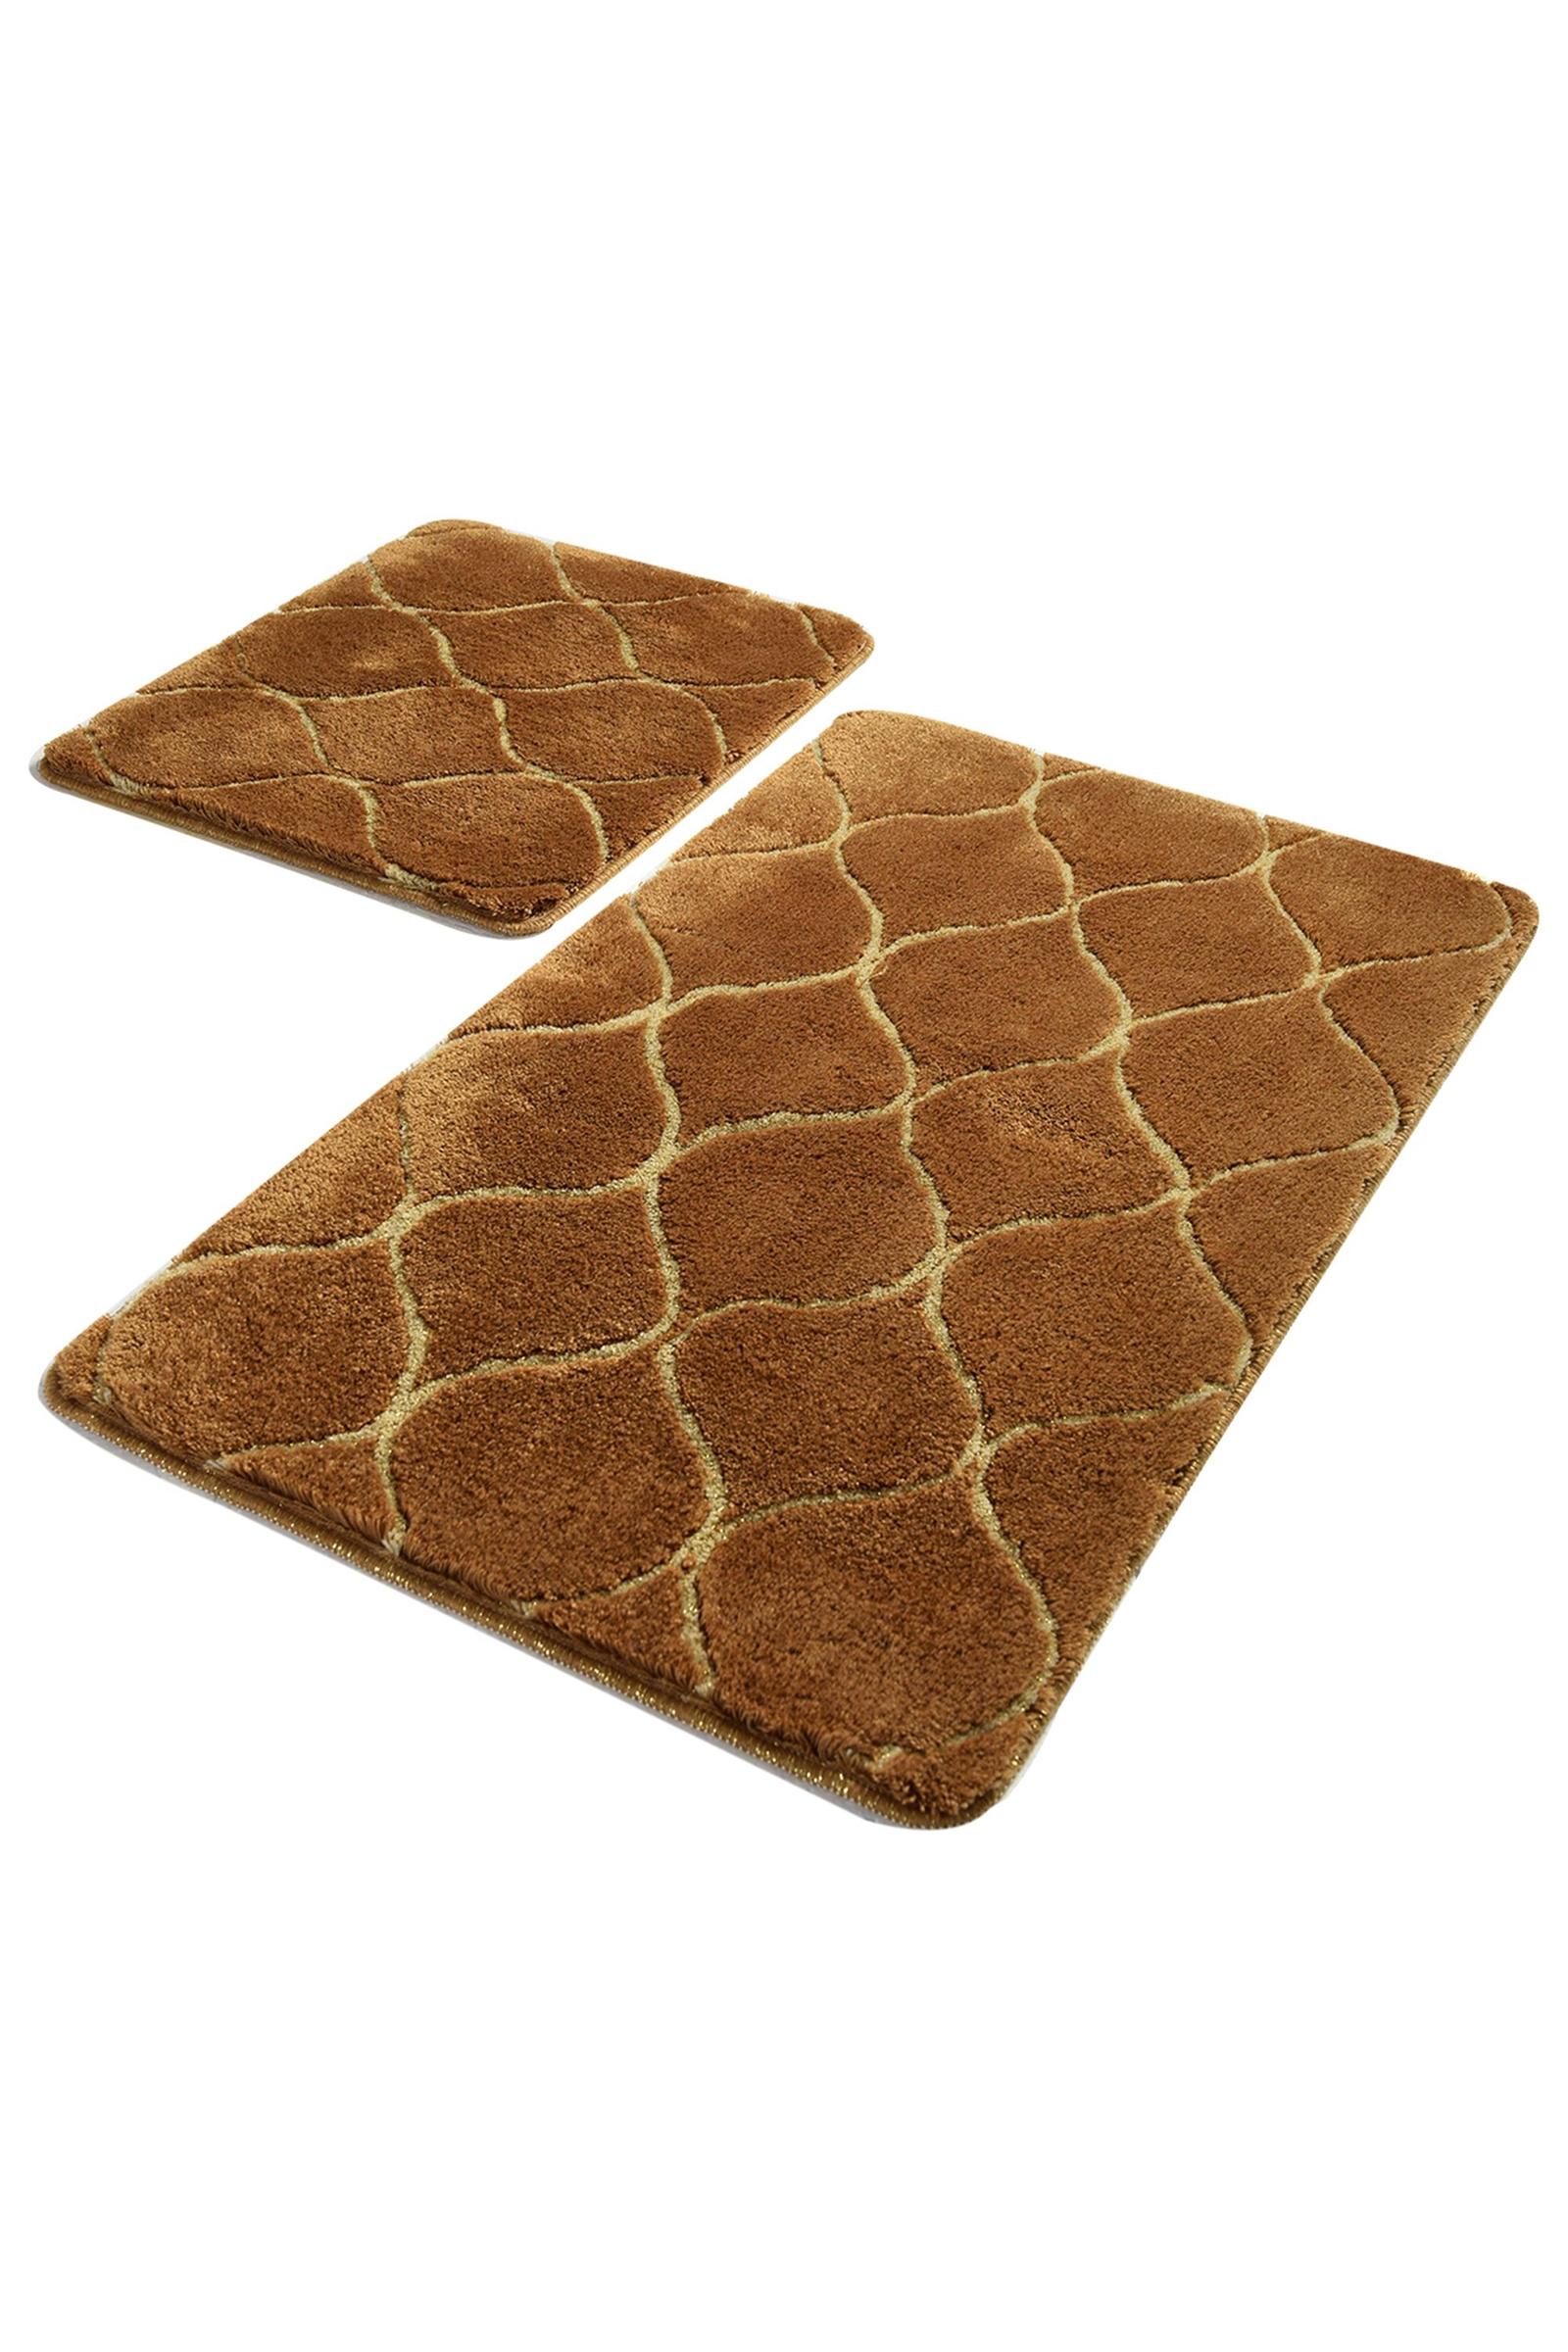 Набор ковриков для ванной DO&CO Коврик для ванной INFINITY_коричневый, коричневый